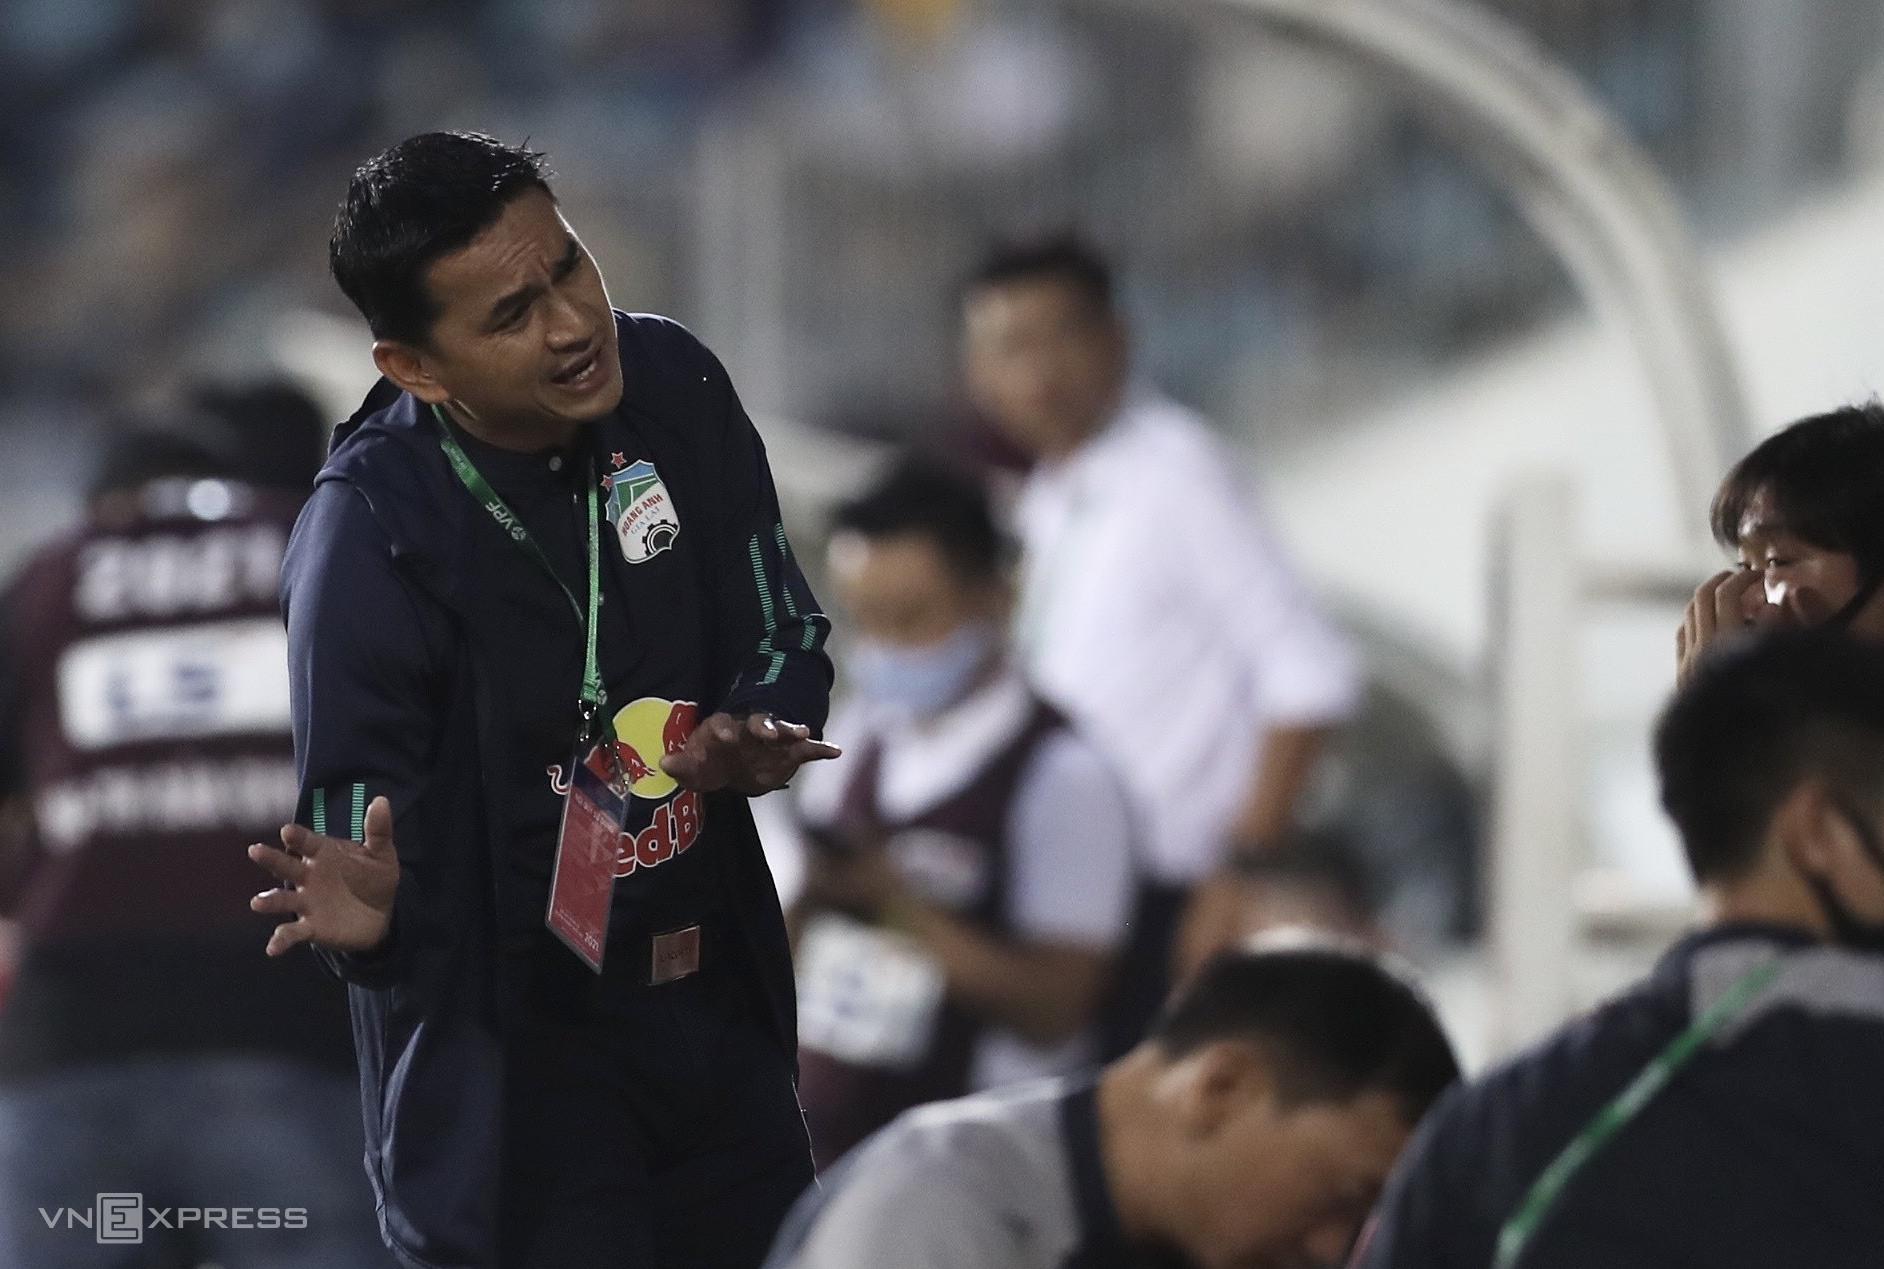 Pertandingan di Hai Phong hari ini akan memiliki arti kunci bagi peluang awal untuk masuk 6 besar untuk balapan di kejuaraan Kiatisuk dan HAGL.  Foto: Duc Dong